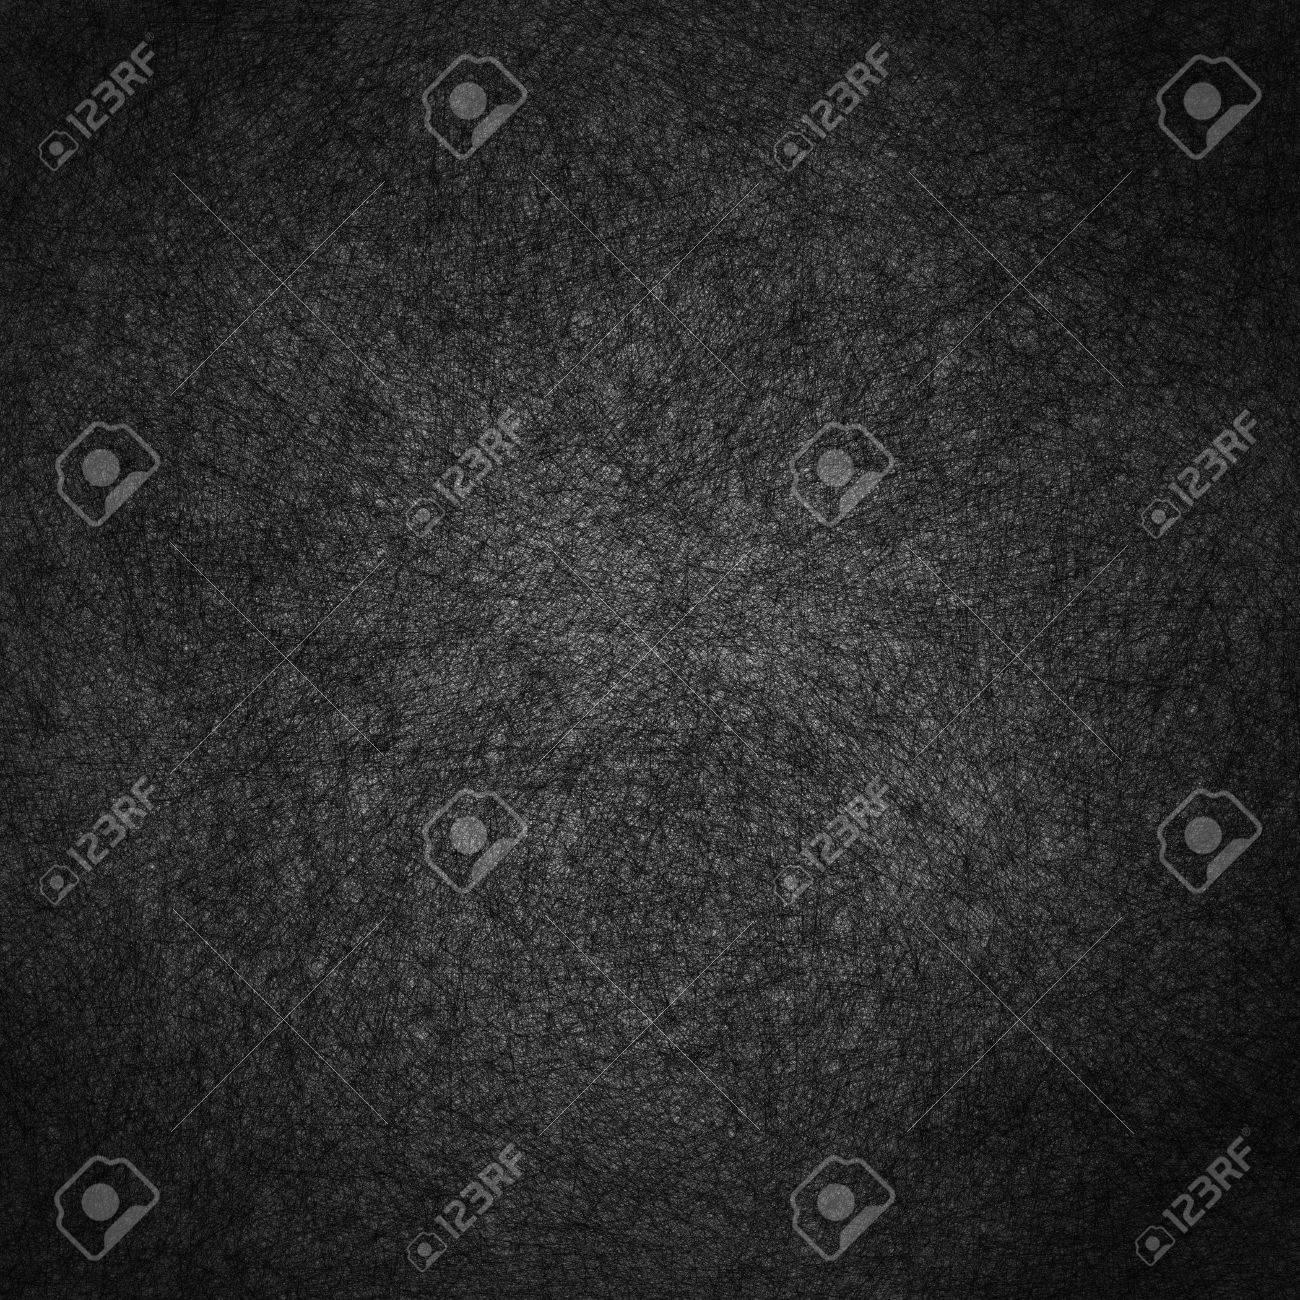 Black Background Paper Gray Center Grunge Vintage Black Paint